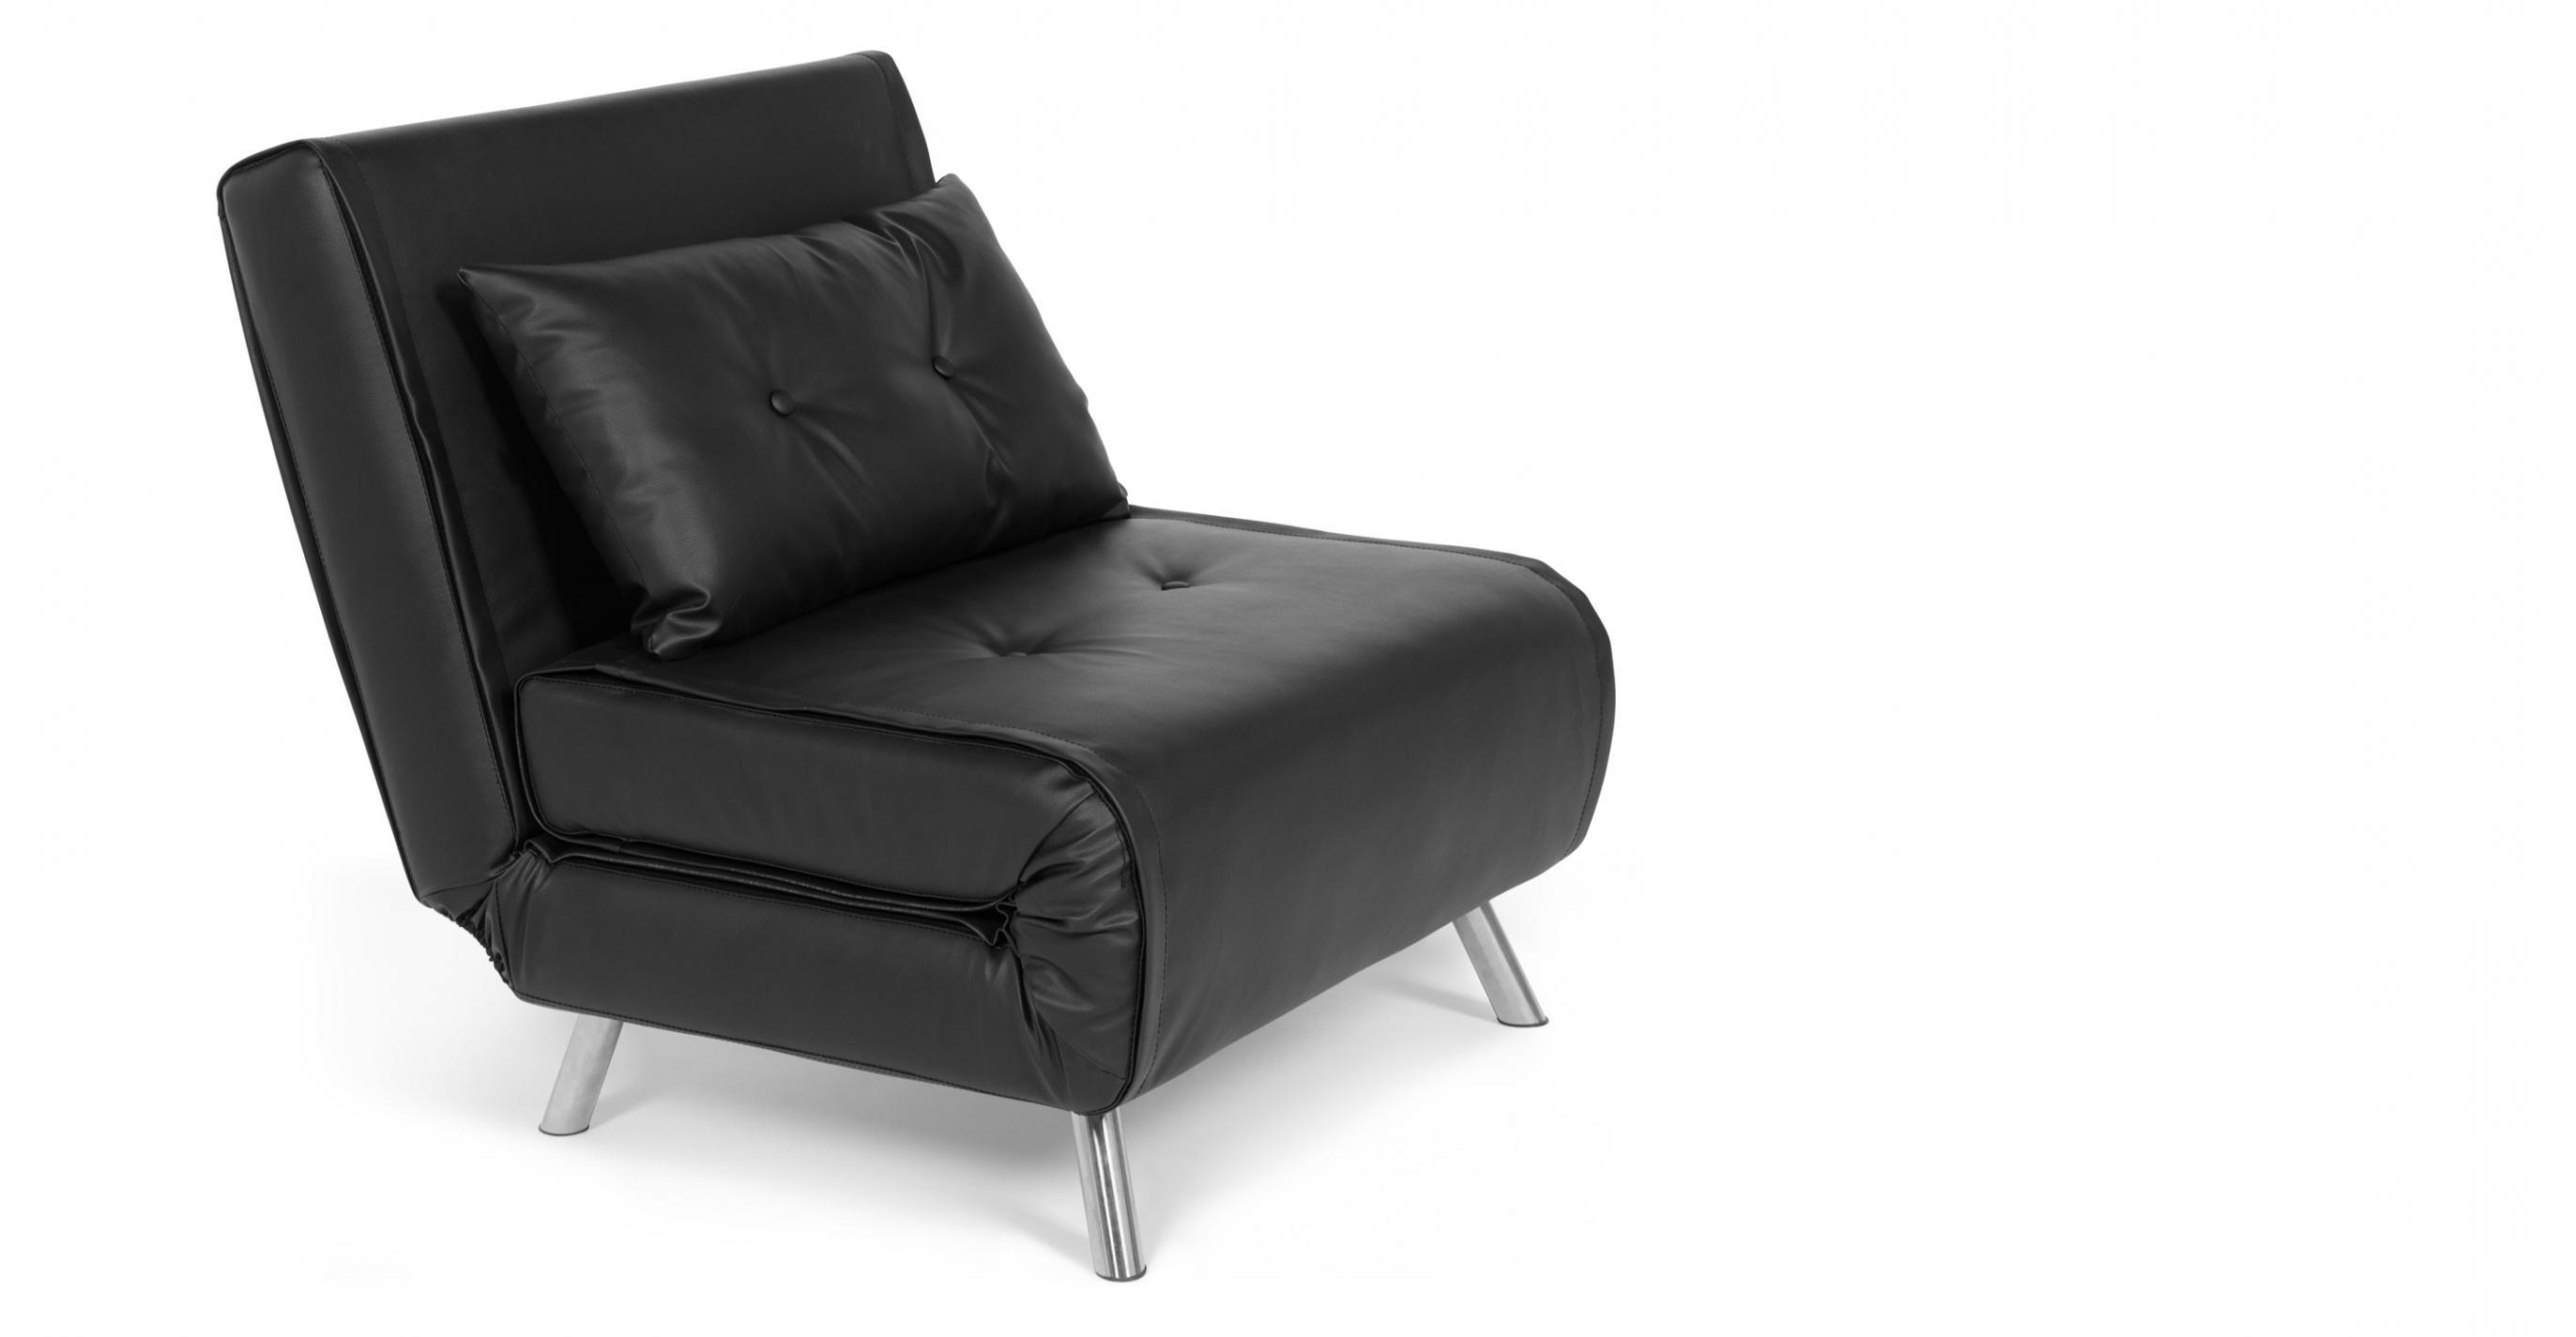 Haru Single Sofa Bed, Garnet Black | Made Inside Single Sofa Bed In Single Sofa Bed Chairs (View 14 of 20)